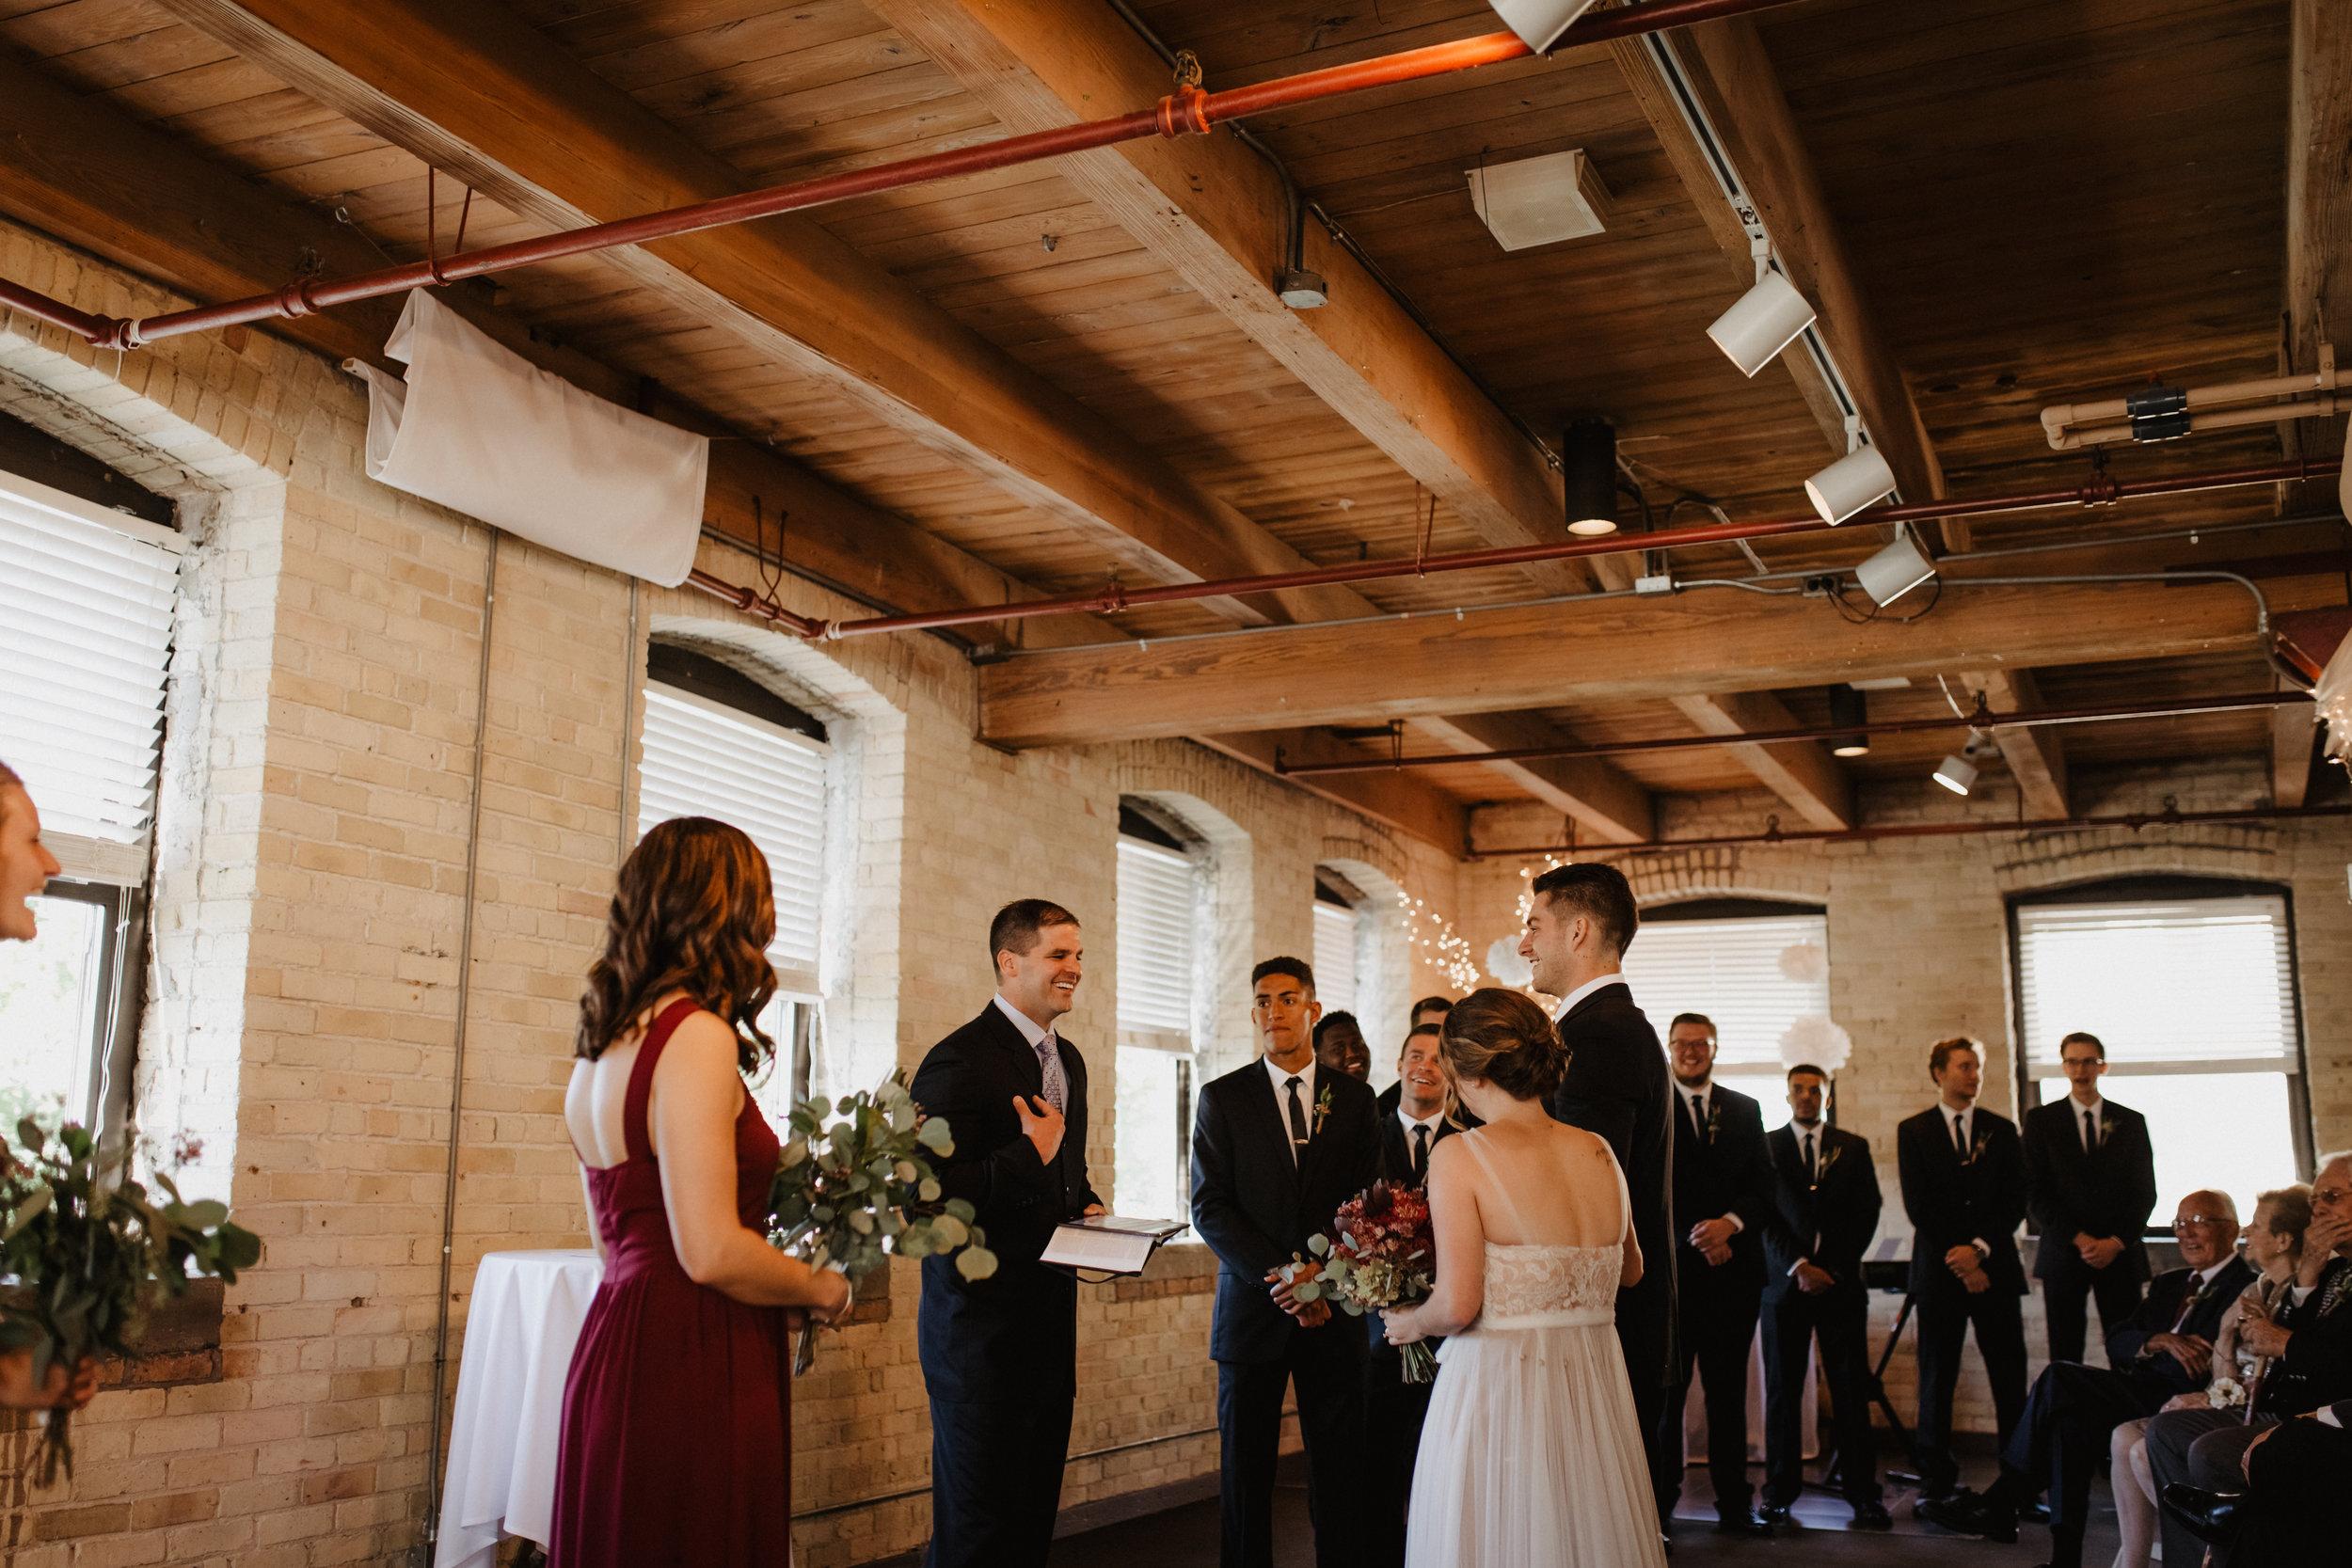 Industrial-Interior-Wedding-Ceremony-Photographer-04